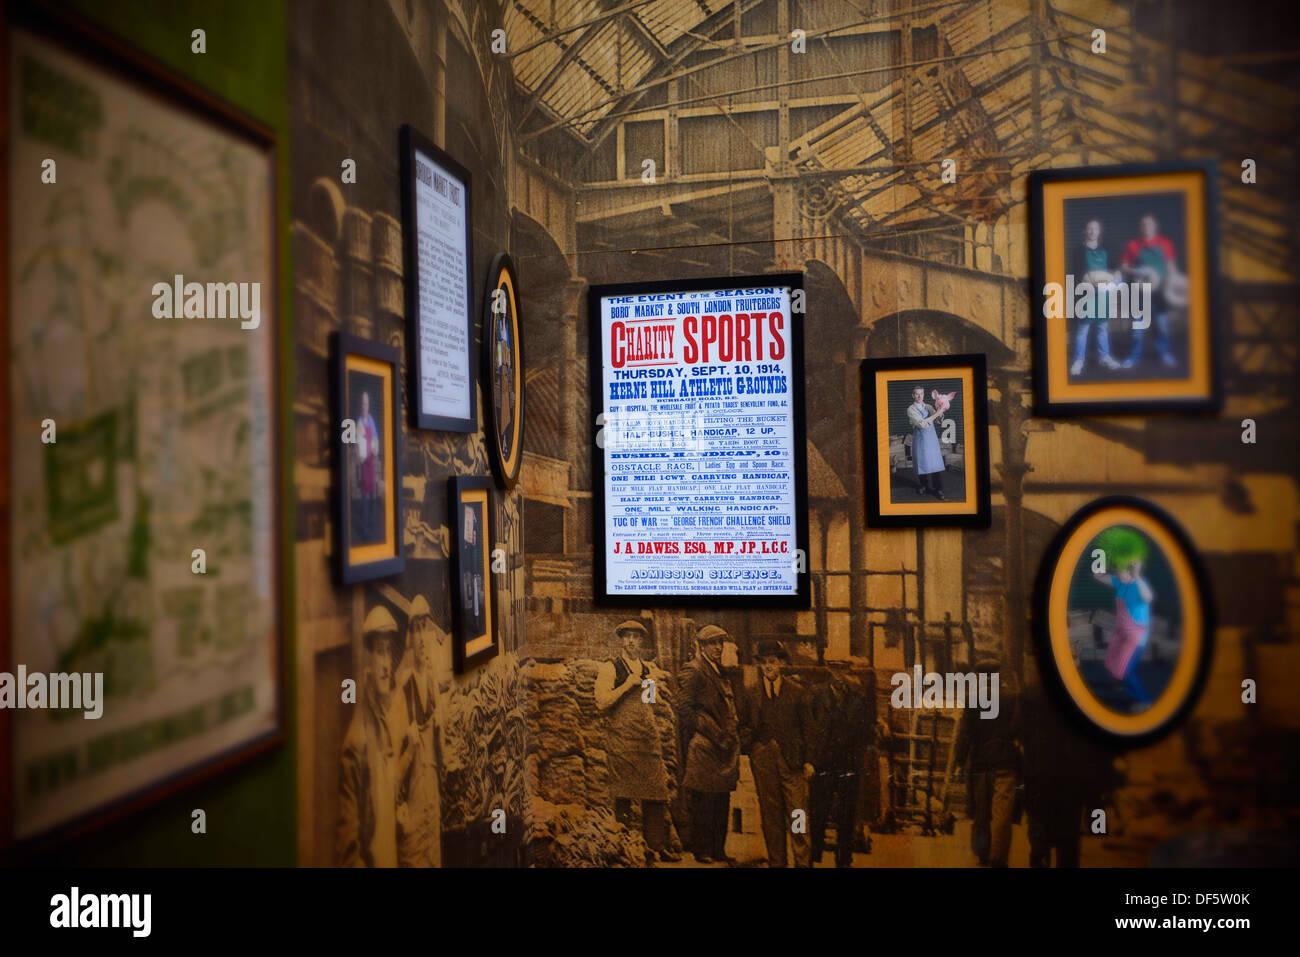 Borough Market, Sign, Sports, Vintage - Stock Image